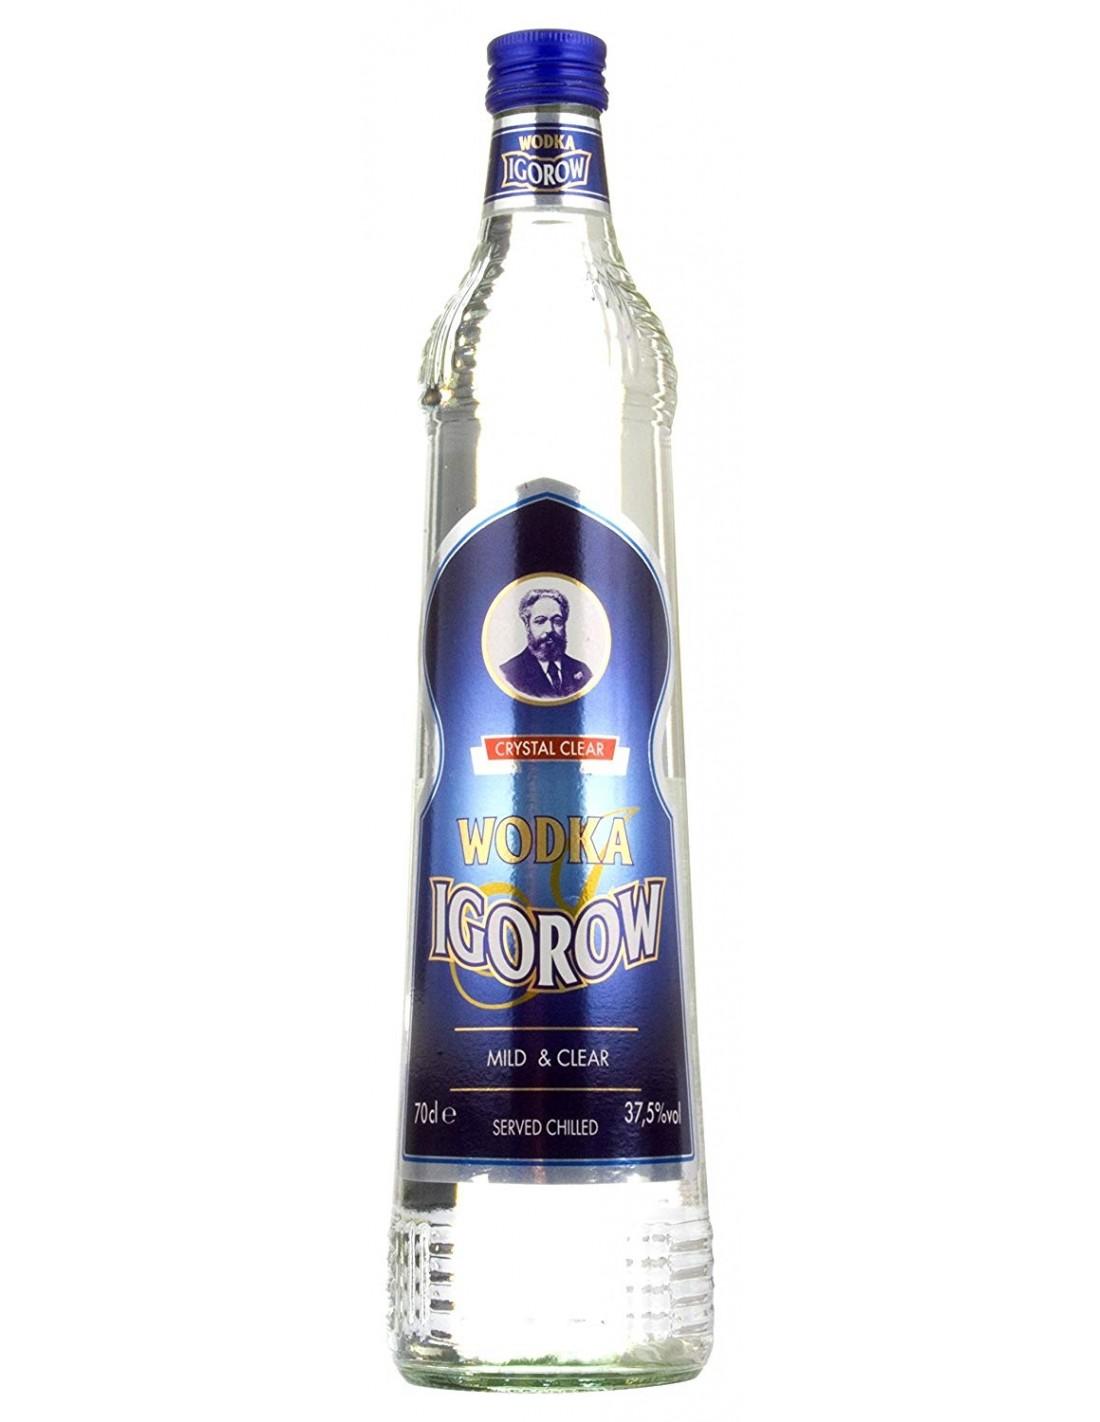 Vodca Igorow 0.7L, 37.5% alc.